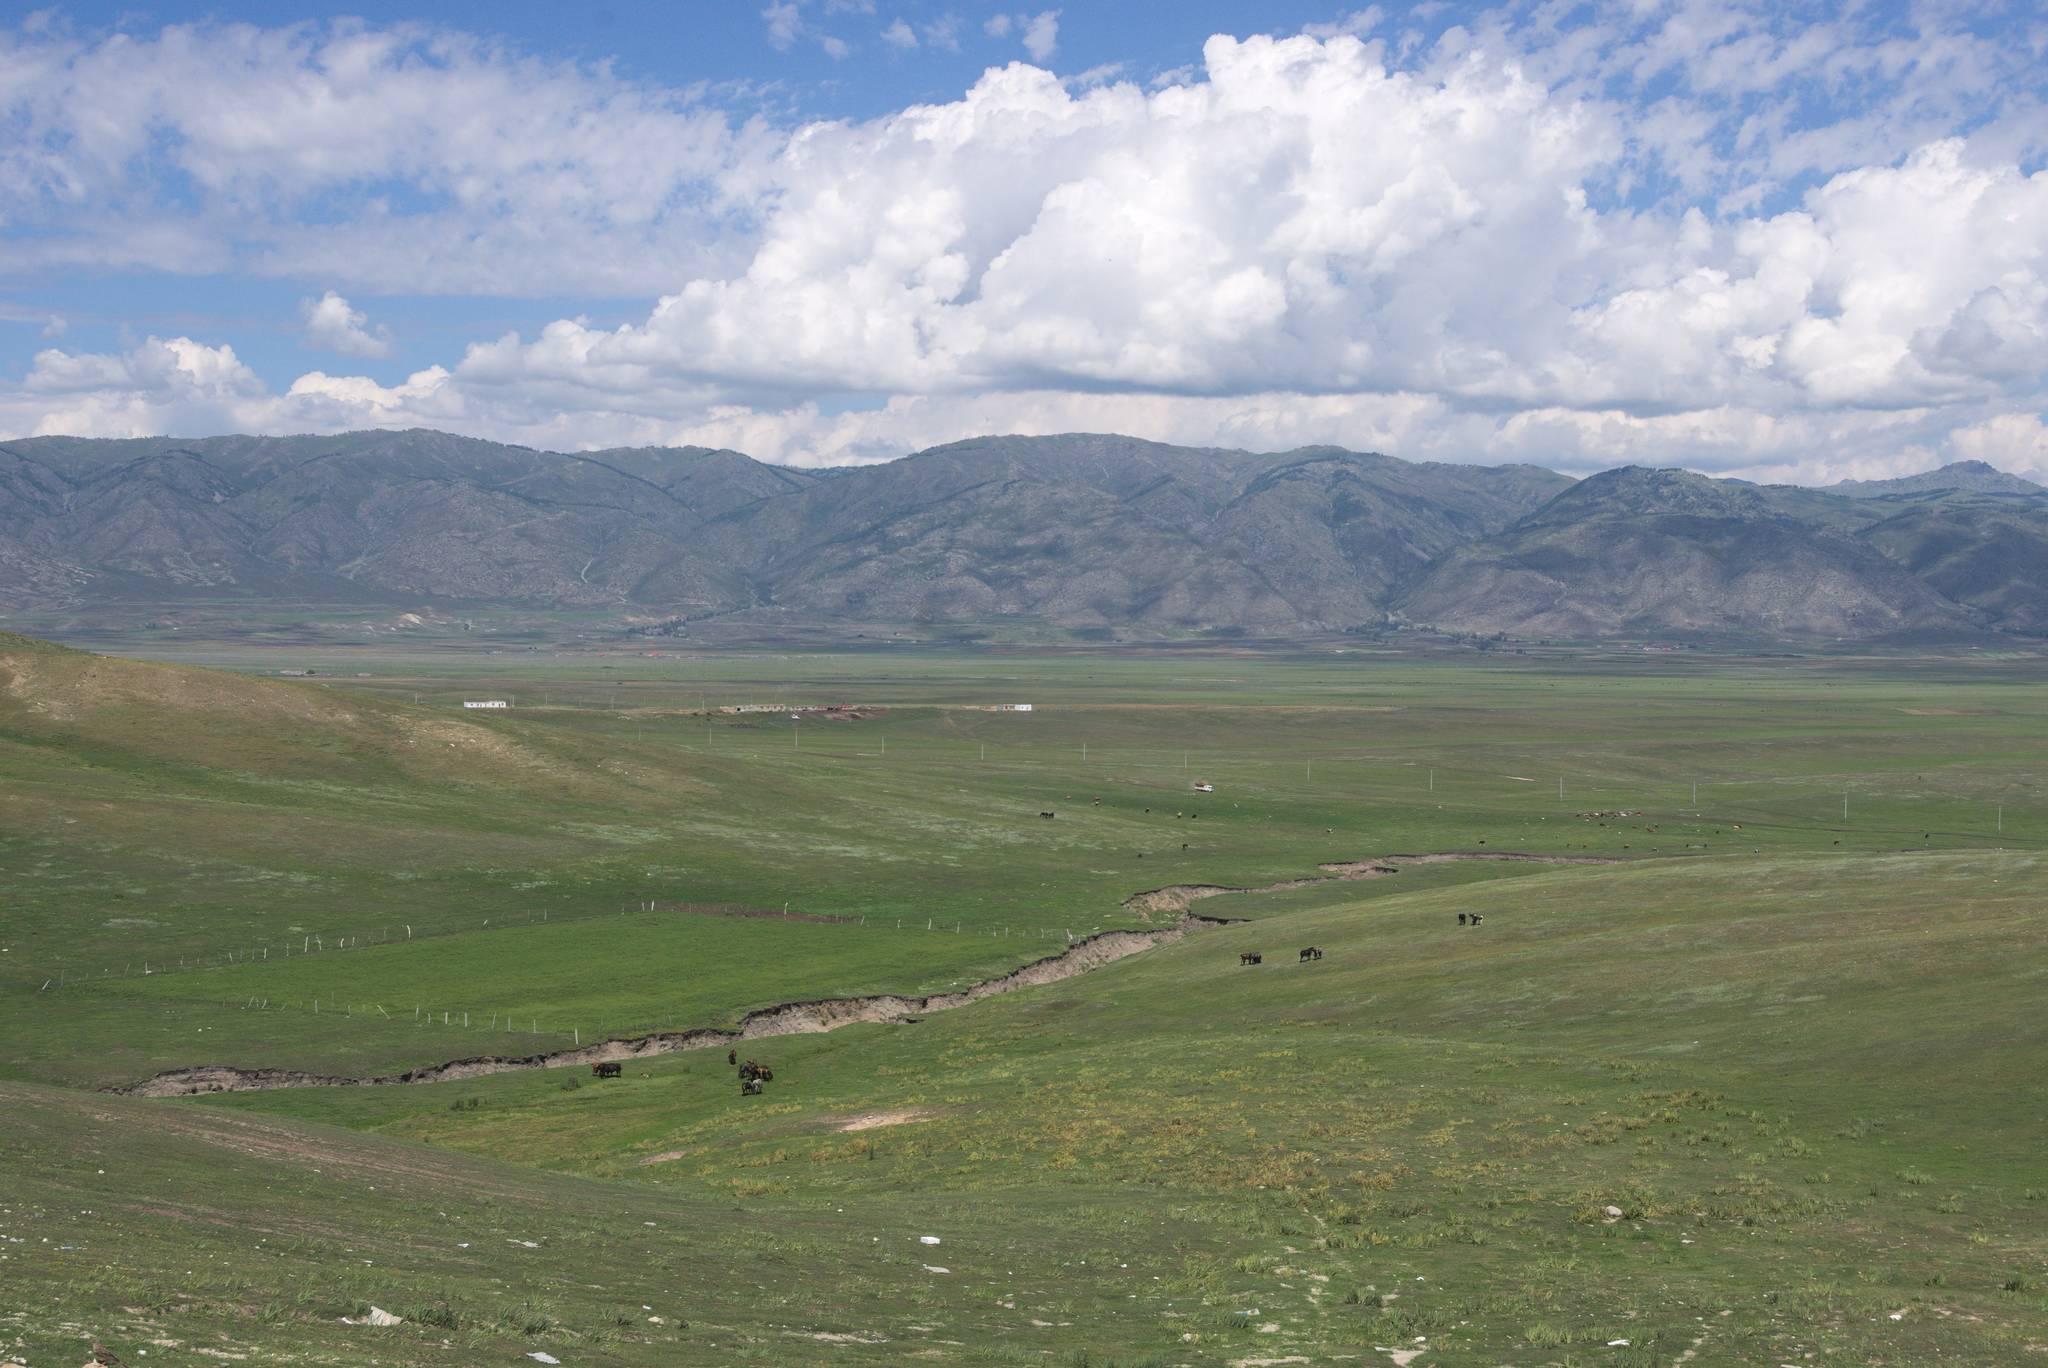 Pastwiska, poza terenem parku